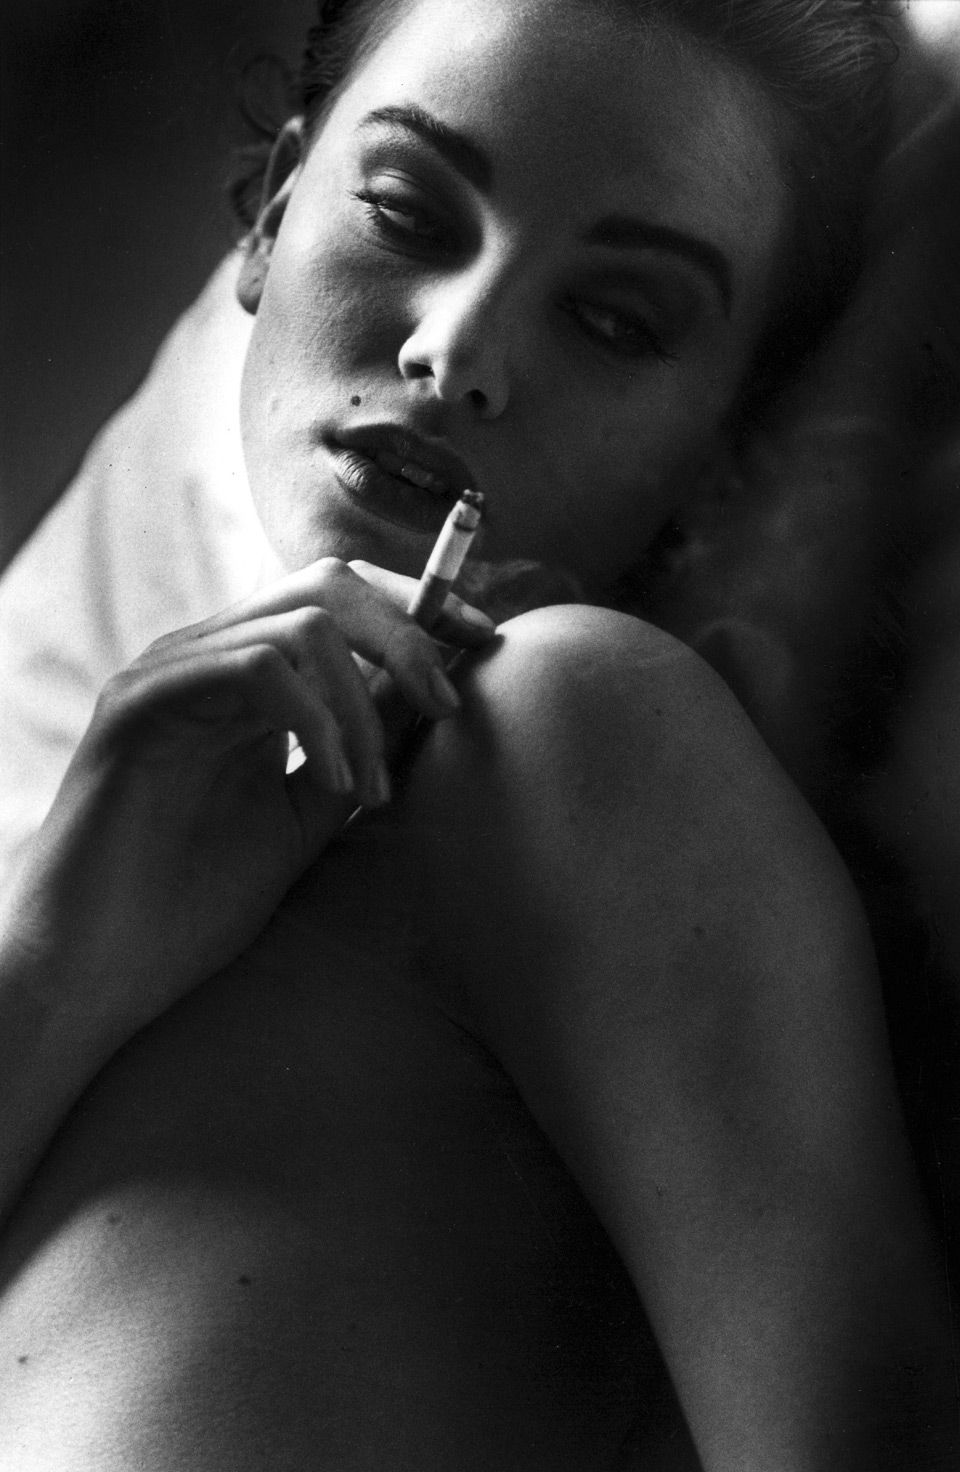 1997 год. Шарлиз Терон для журнала GQ. Фото: Lance Staedler